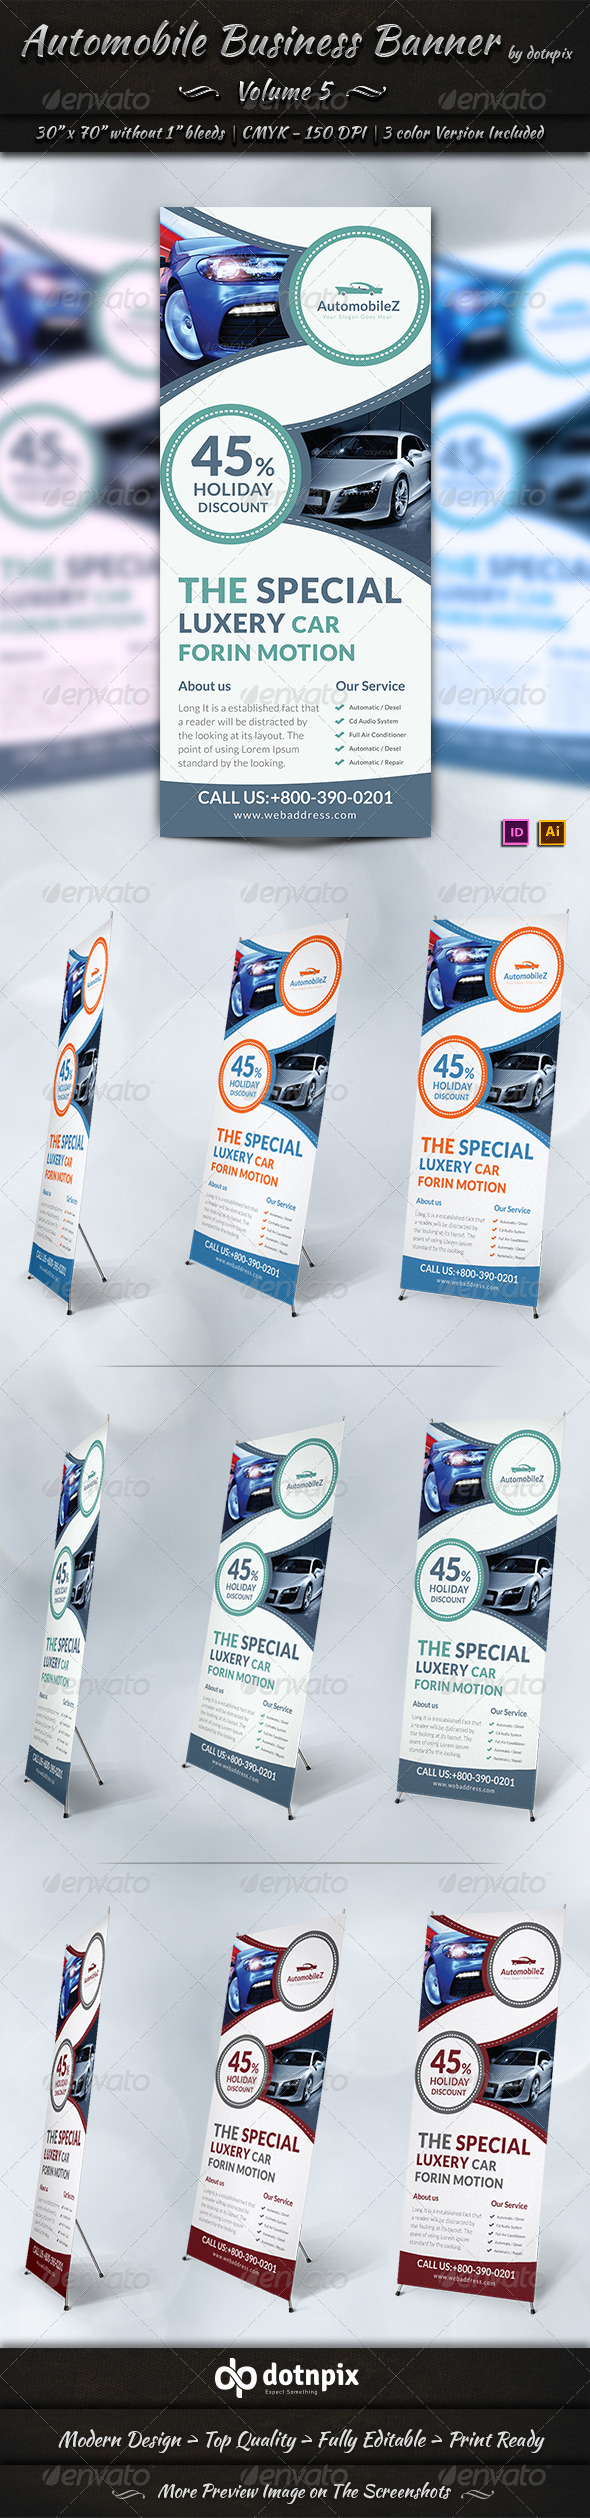 GraphicRiver Automobile Business Banner Volume 5 7776001